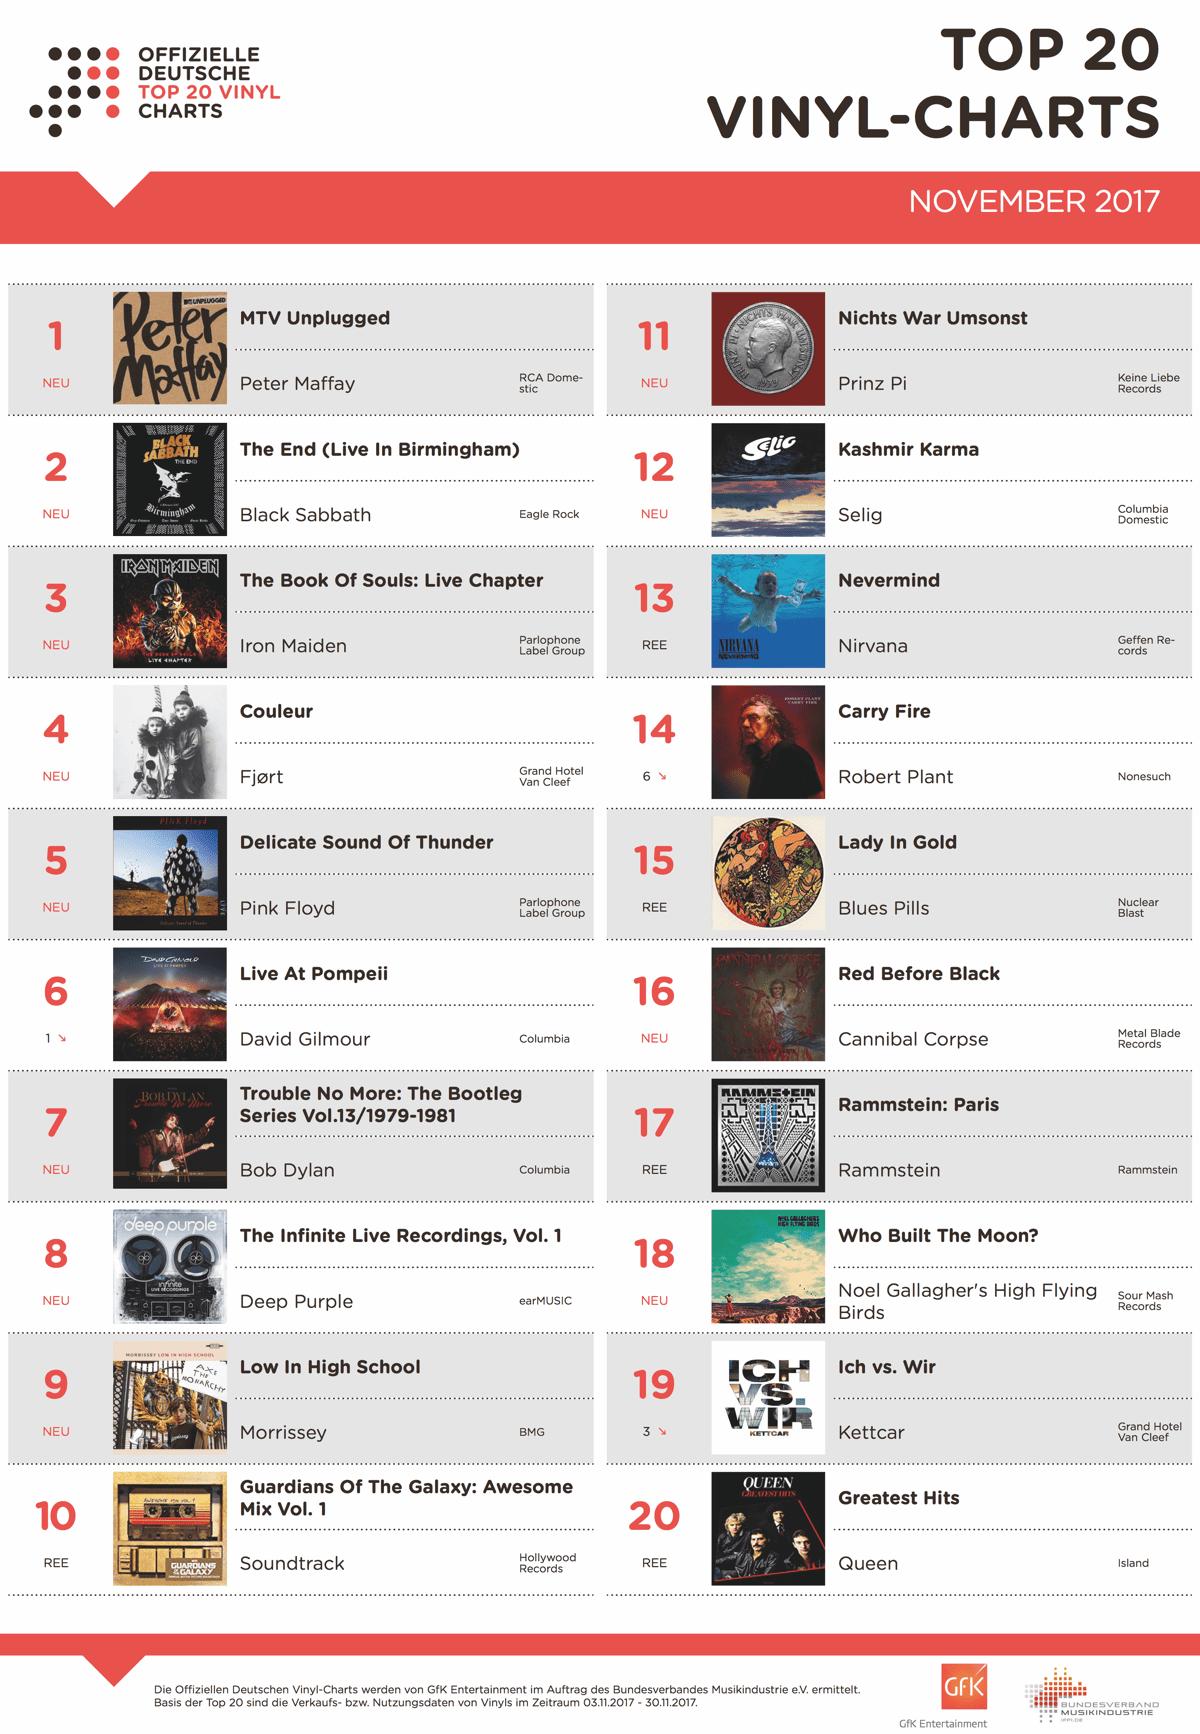 Offizielle Deutsche Vinyl-Charts Top 20 November 2017